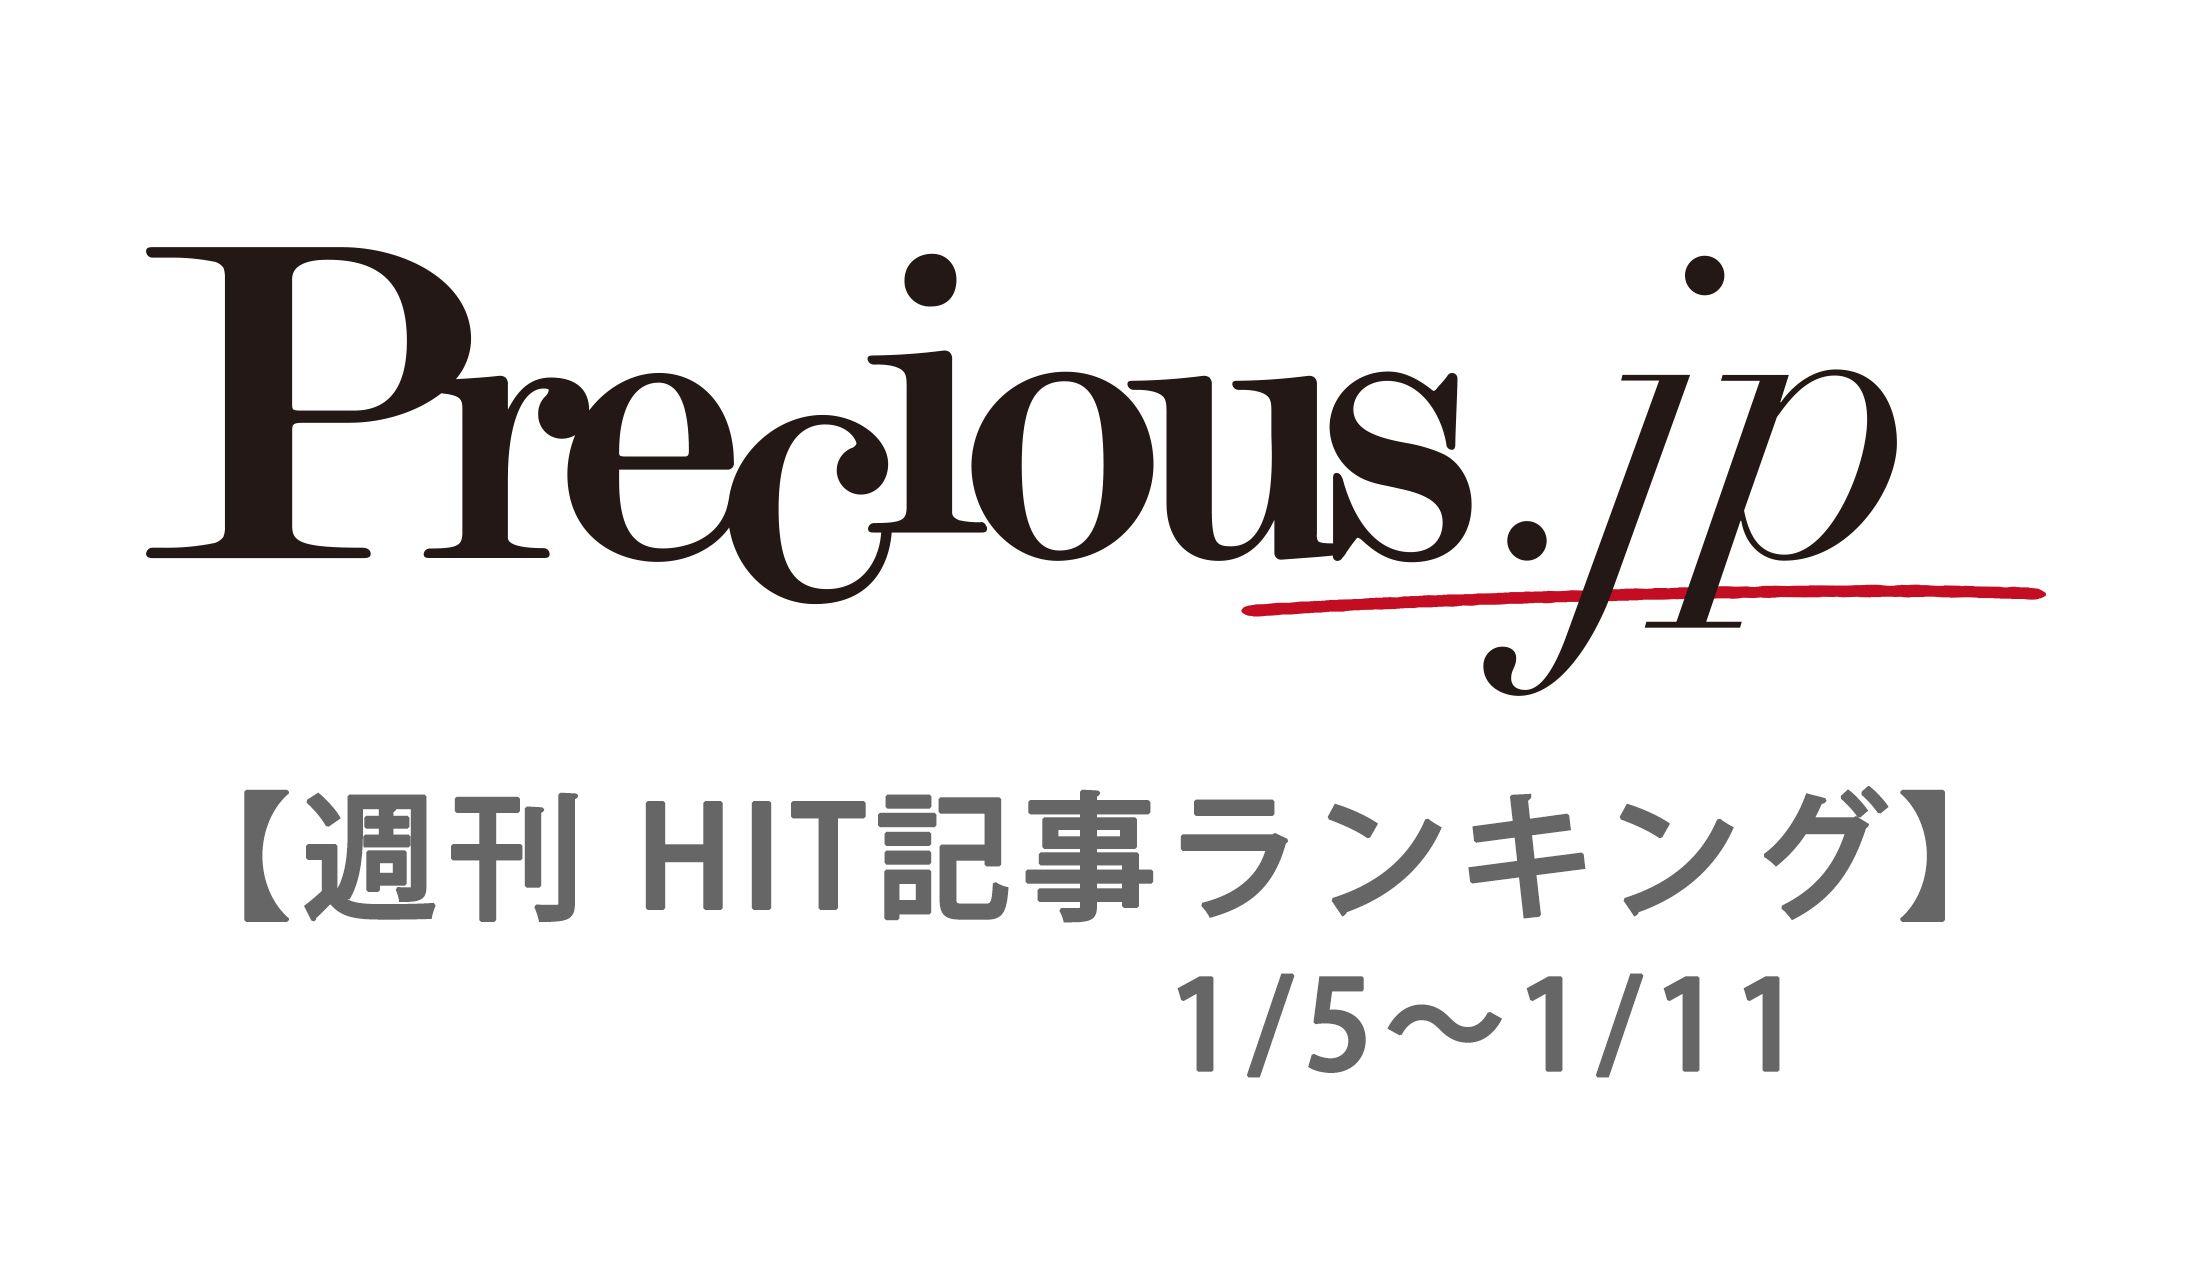 precious.jpの人気記事ランキング【1月5日~1月11日】